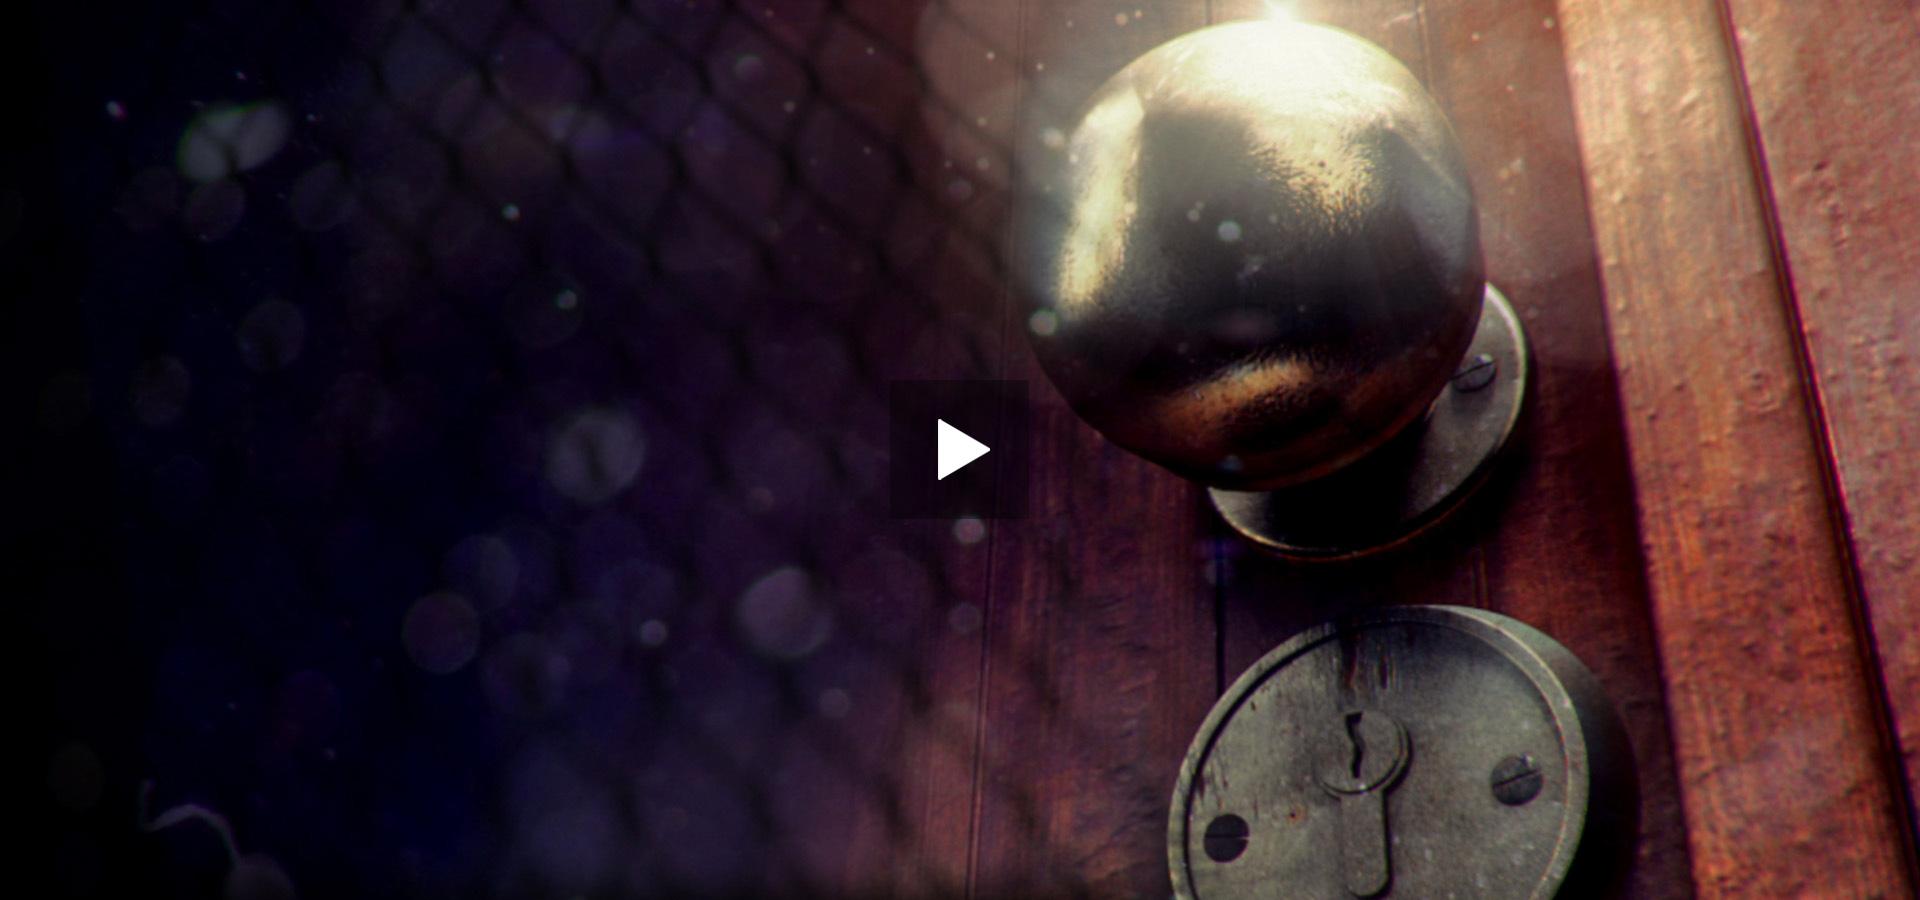 Monkey Talkie per Mediaset Premium Crime - Broadcast design - TV Branding - Promo - Idents